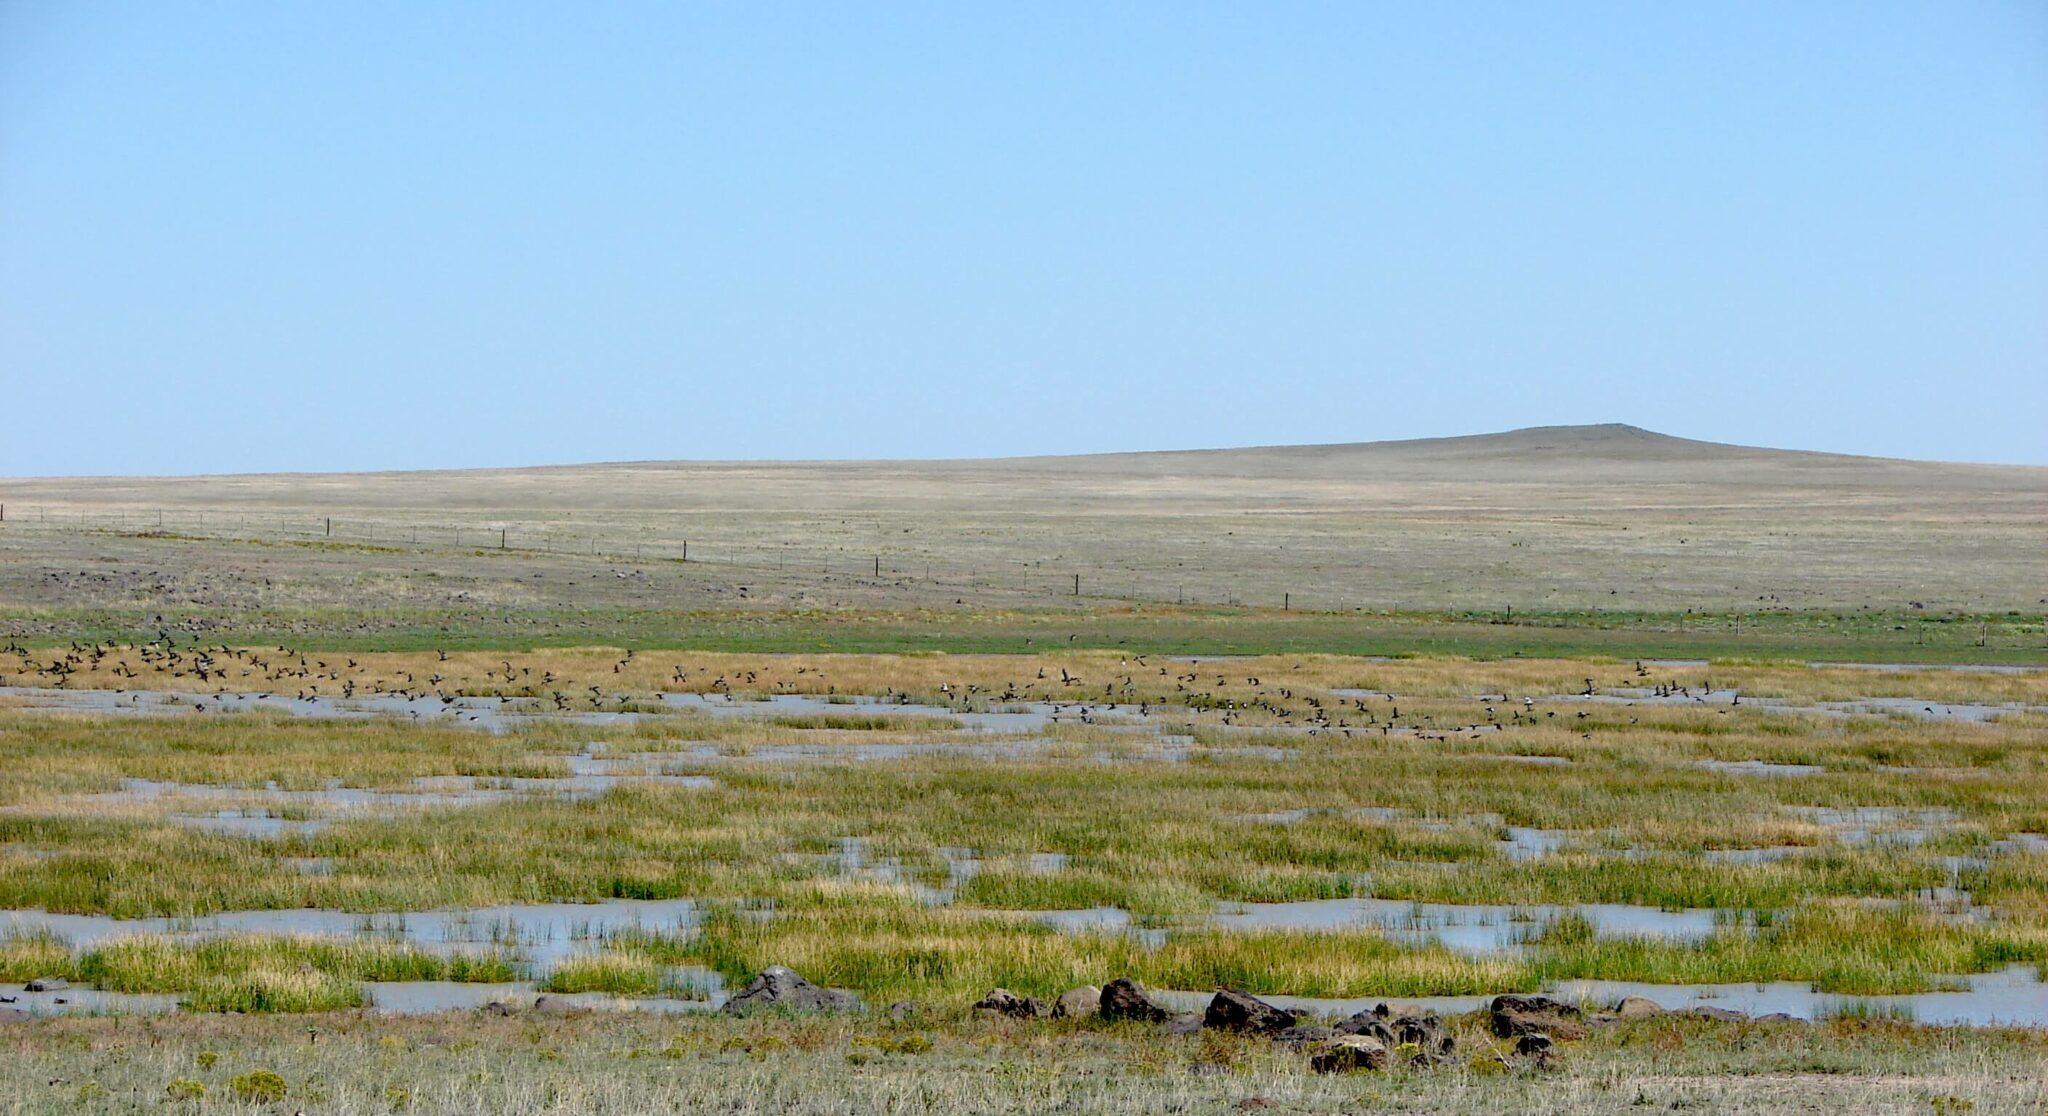 Rock Lake Playa at Kiowa National Grassland in Harding County, NM. Photo: A. Safranek USFS